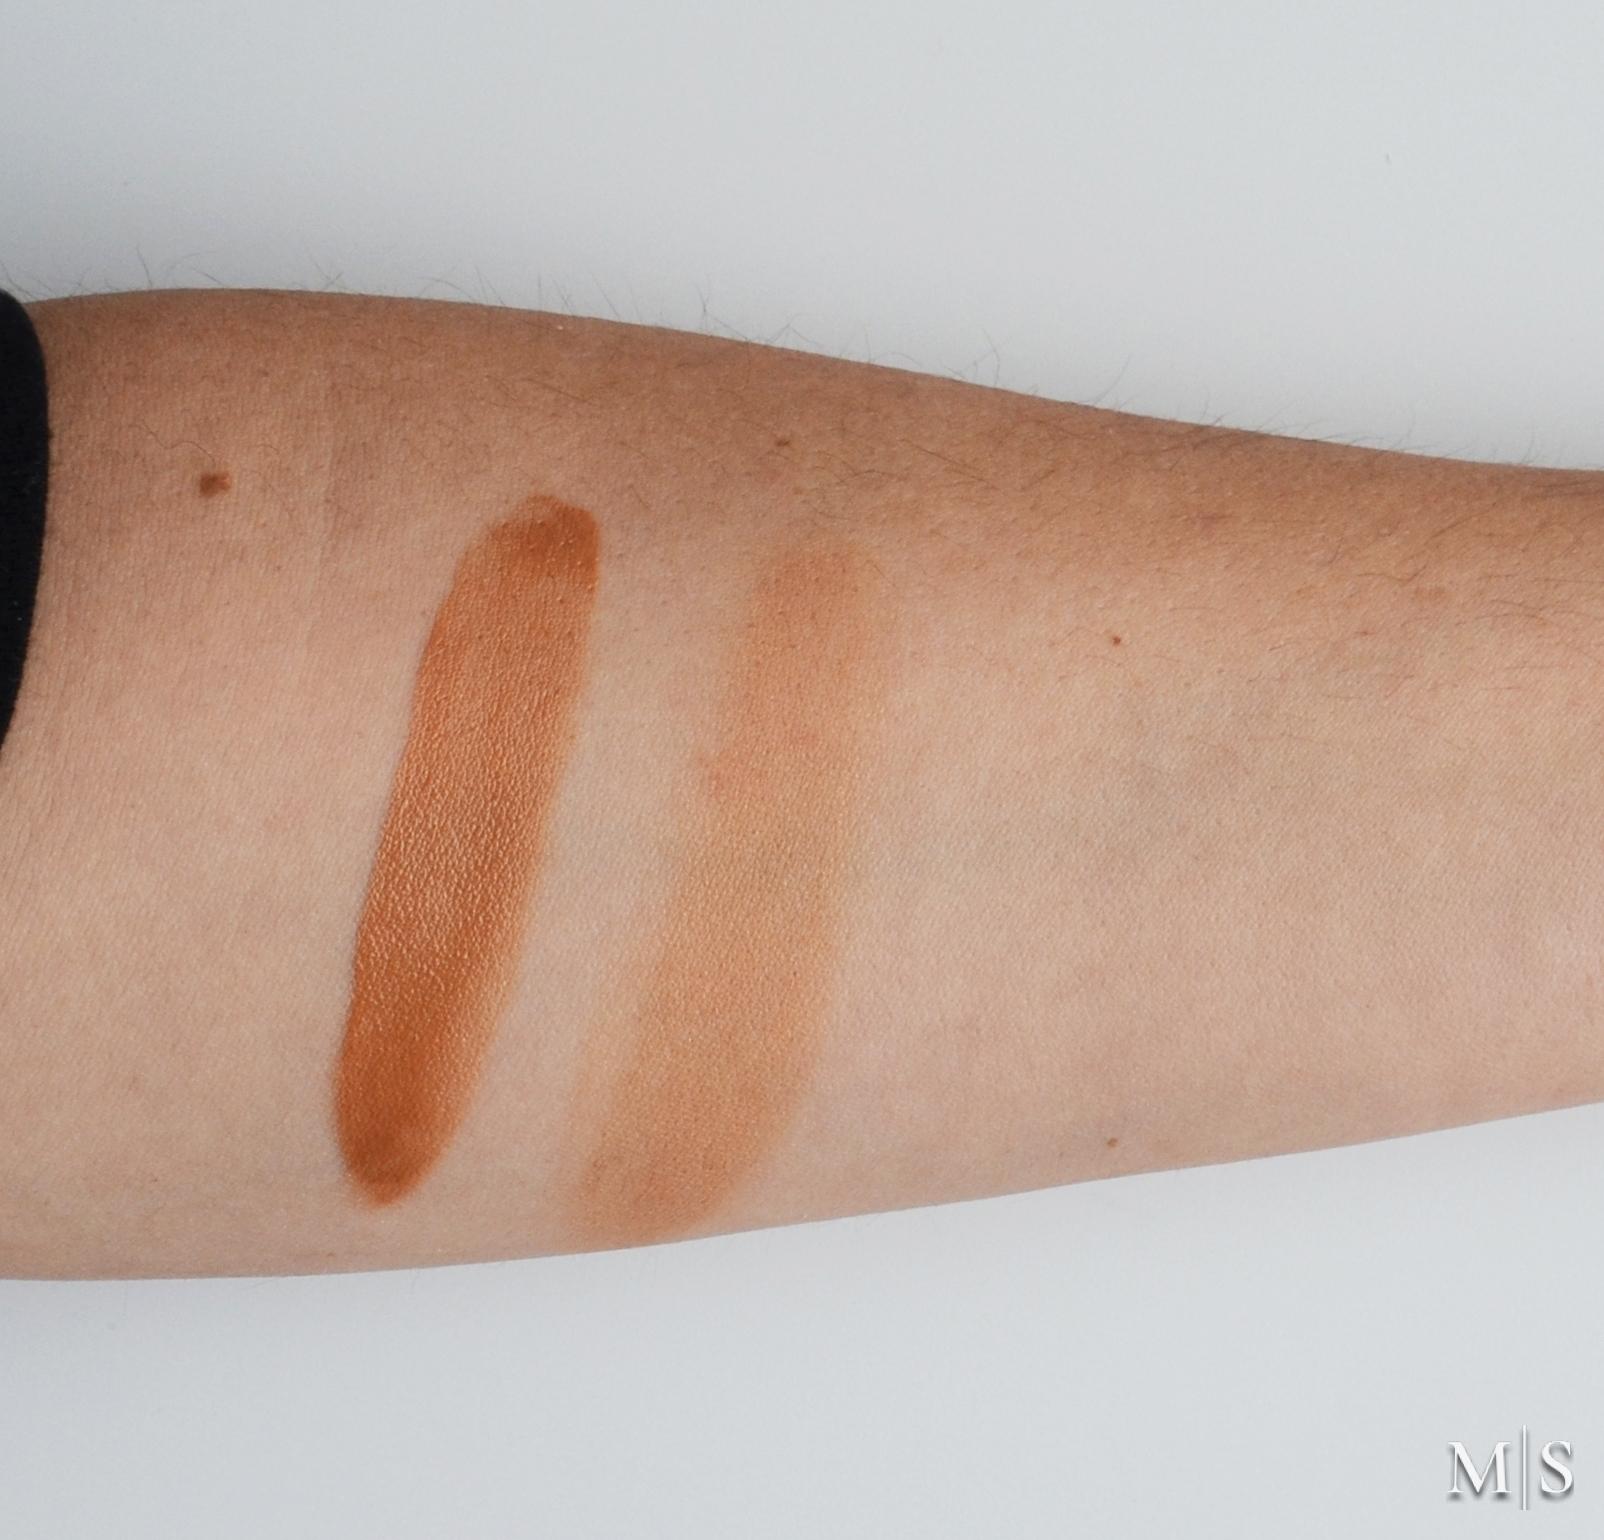 NARS Laguna Liquid Bronzer Review u0026 Swatches - Makeup-Sessions